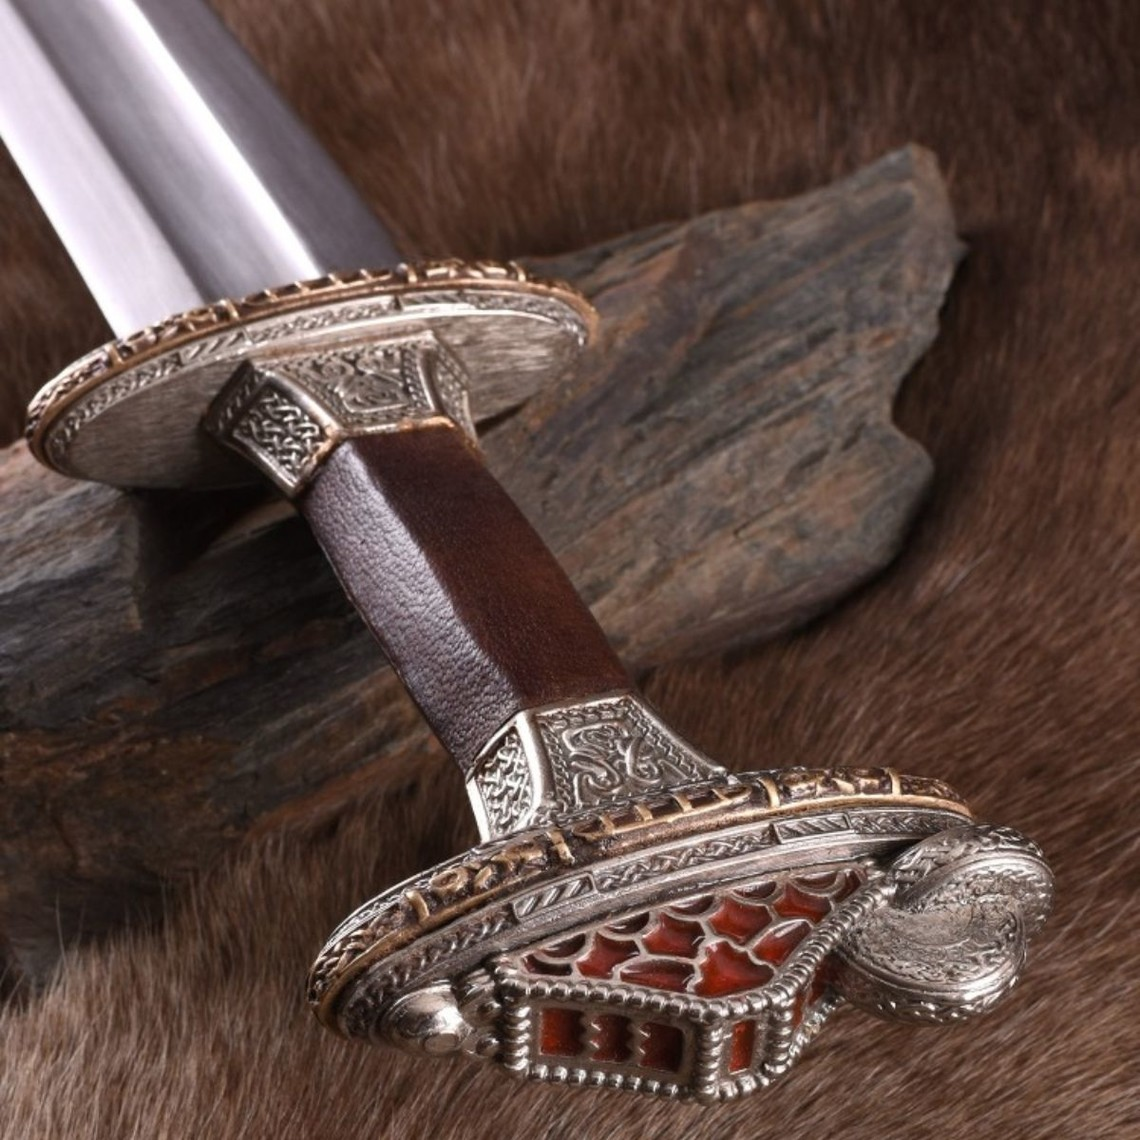 Deepeeka Vendel Schwert Uppsala 7. bis 8. Jahrhundert, verzinnte Griff